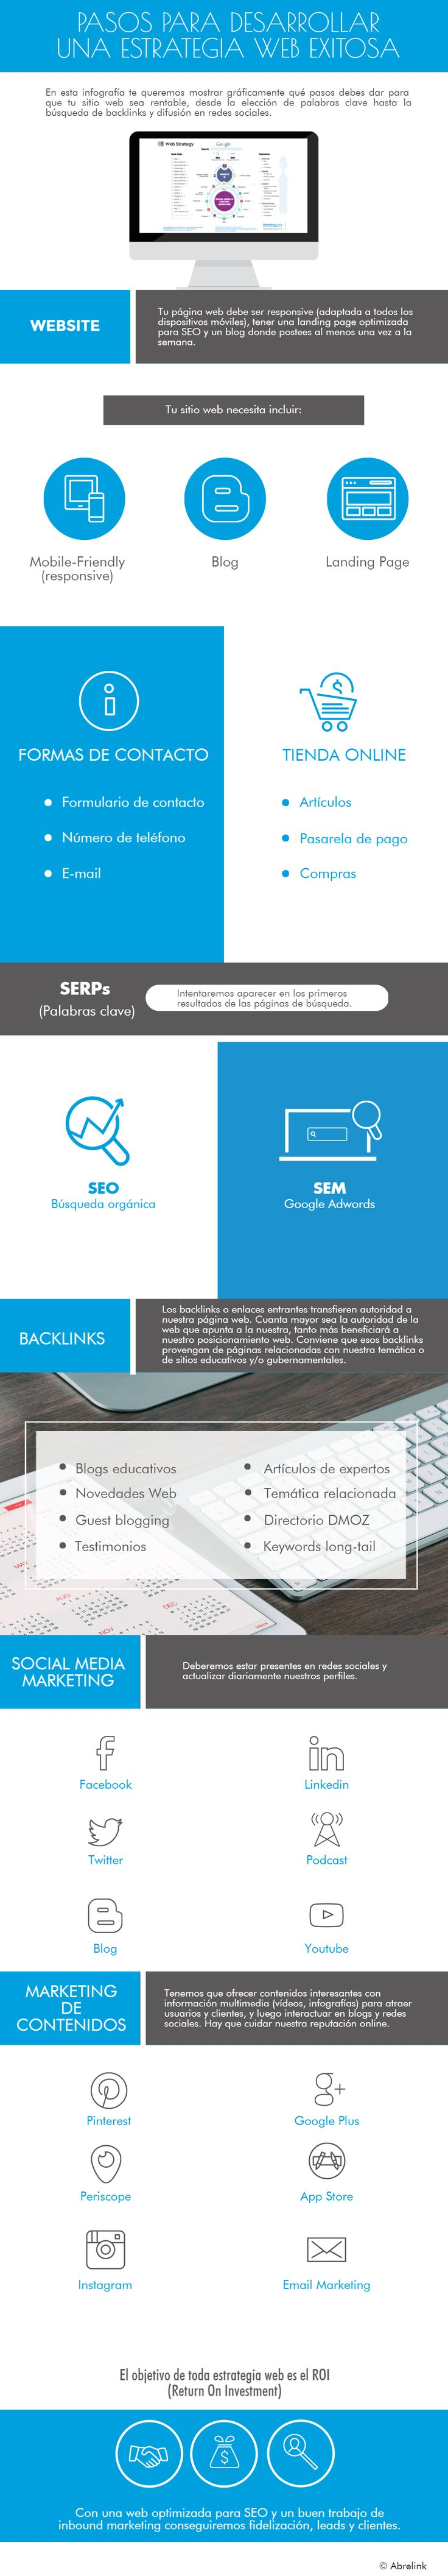 Pasos para desarrollar una web de éxito #infografia